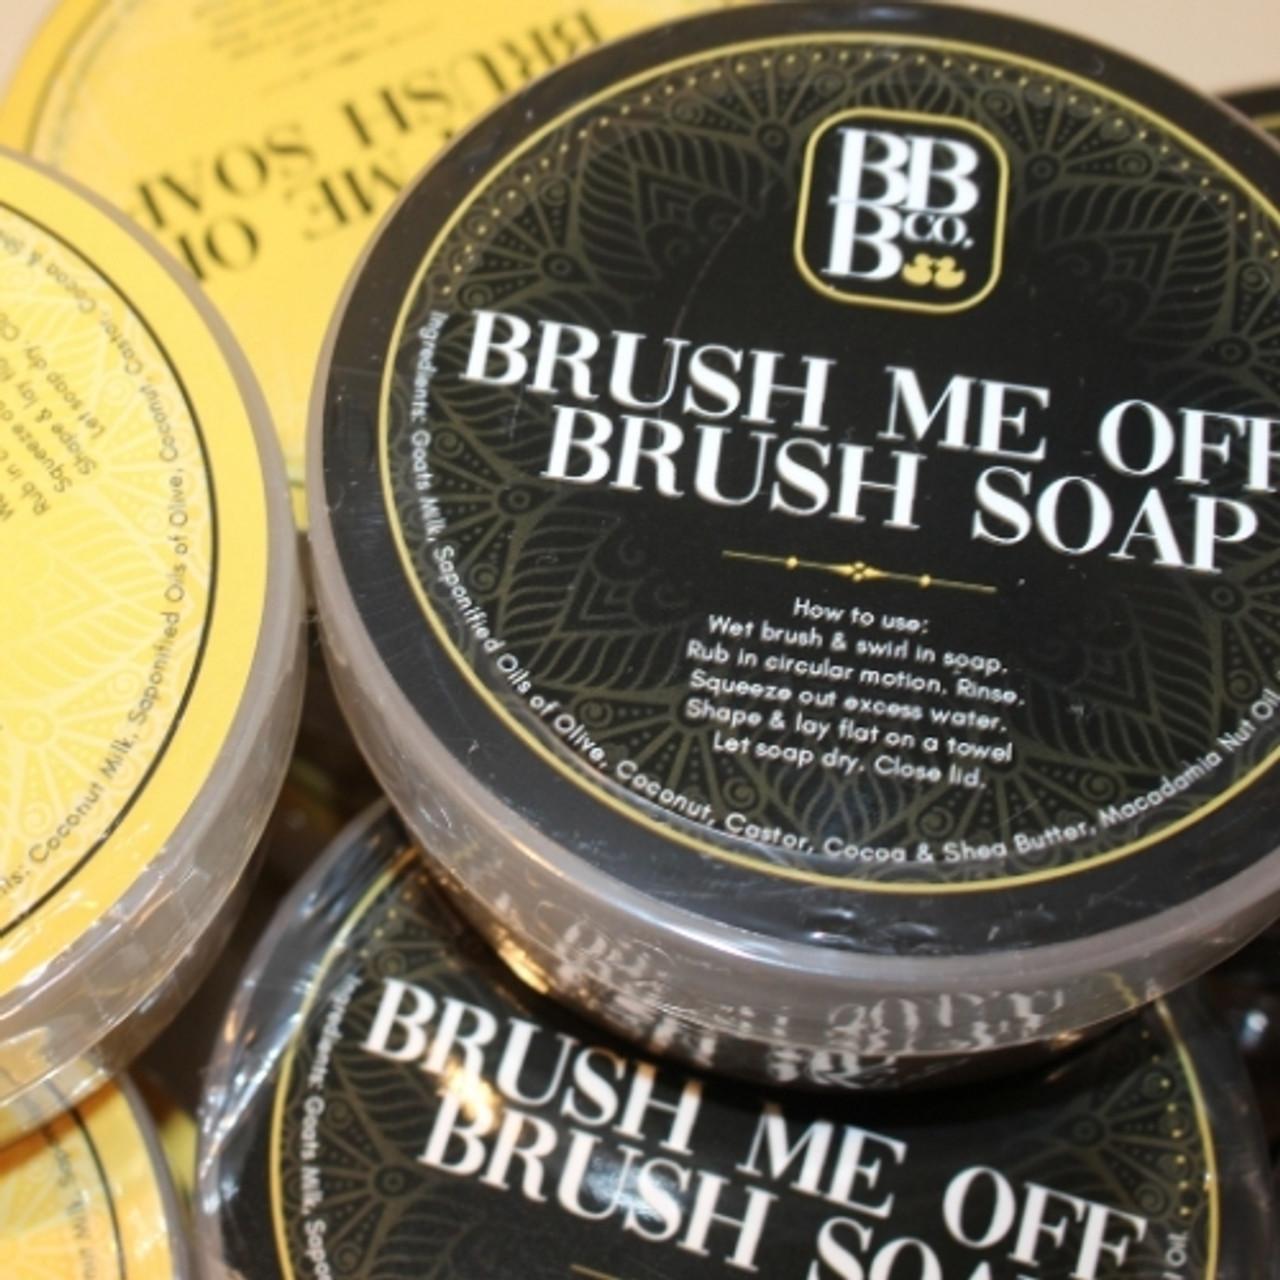 Brush Me Off Soap